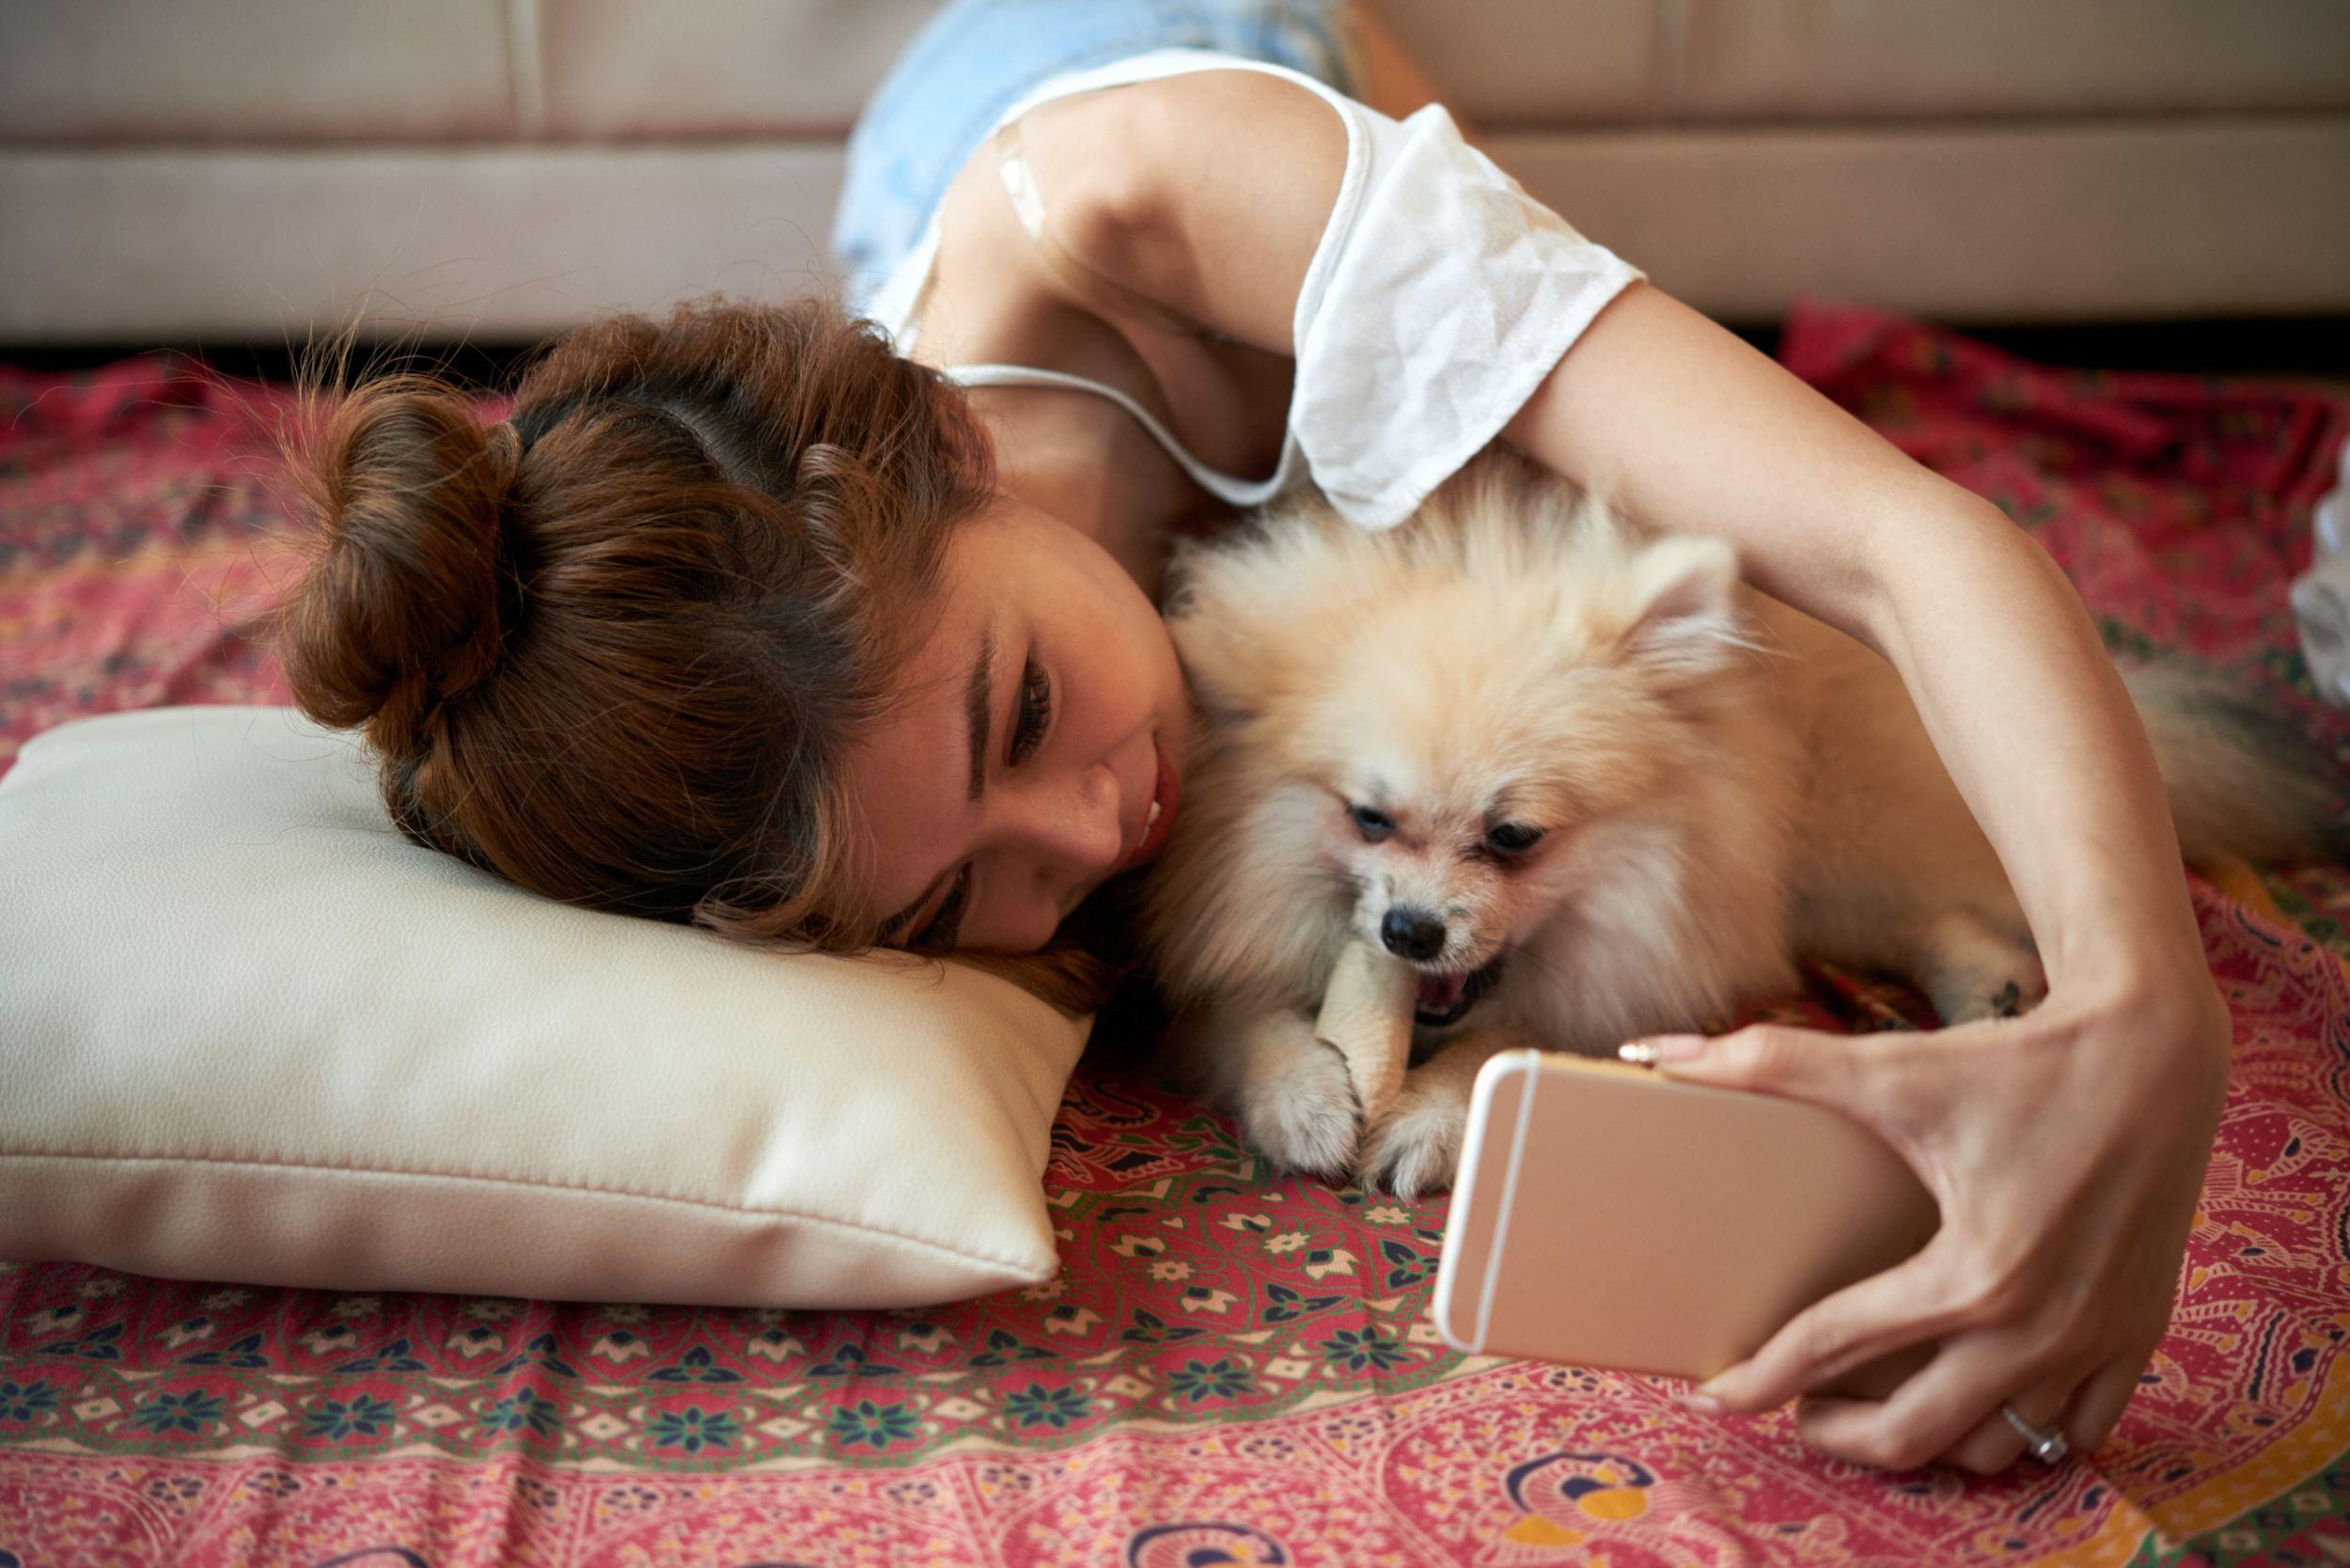 Dogilike.com :: เชื่อป่ะ โพสต์รูปหมาลงโซเชียลโอกาสได้คู่กว่าโพสต์รูปเซ็กซี่ของตัวเอง